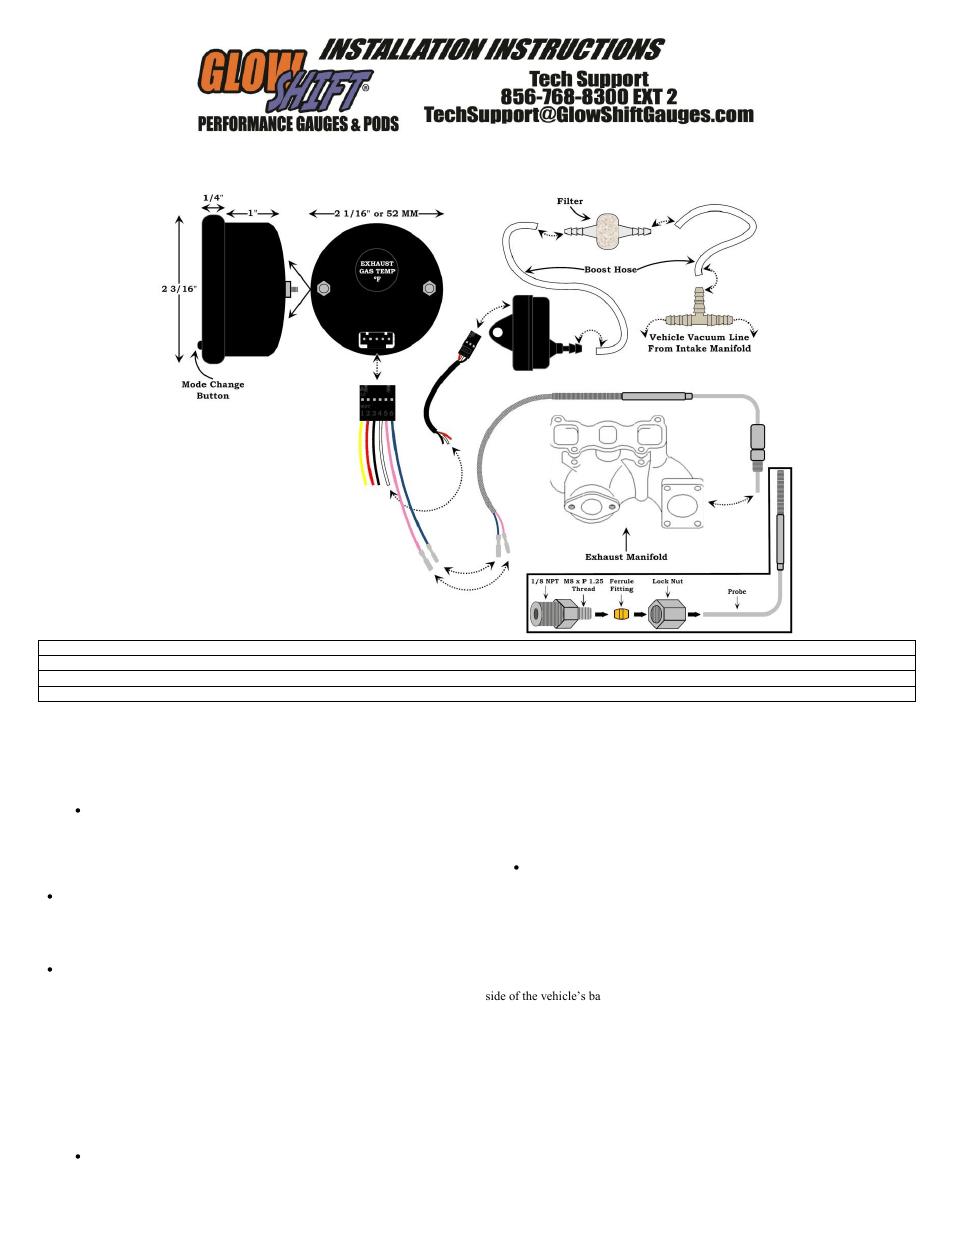 FE041 Egt Wiring Diagram | Digital Resources on 1990 skylark fuse diagram, yamaha outboard wiring diagram, temperature diagram,